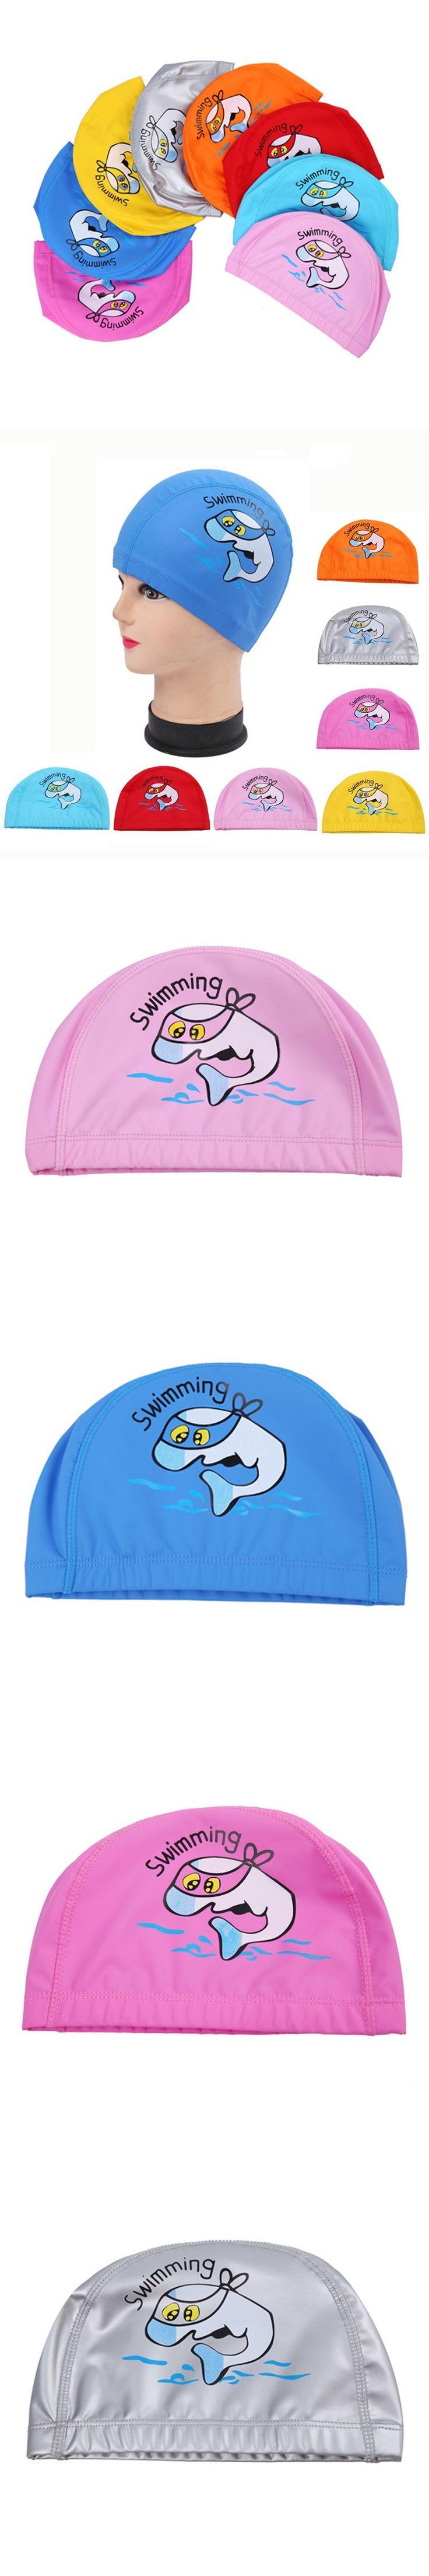 Cartoon Dolphin Waterproof PU Fabric Long Hair Ear Protection Children Kids Swim Pool Water Sport Swimming Cap Hat for Boys Girl